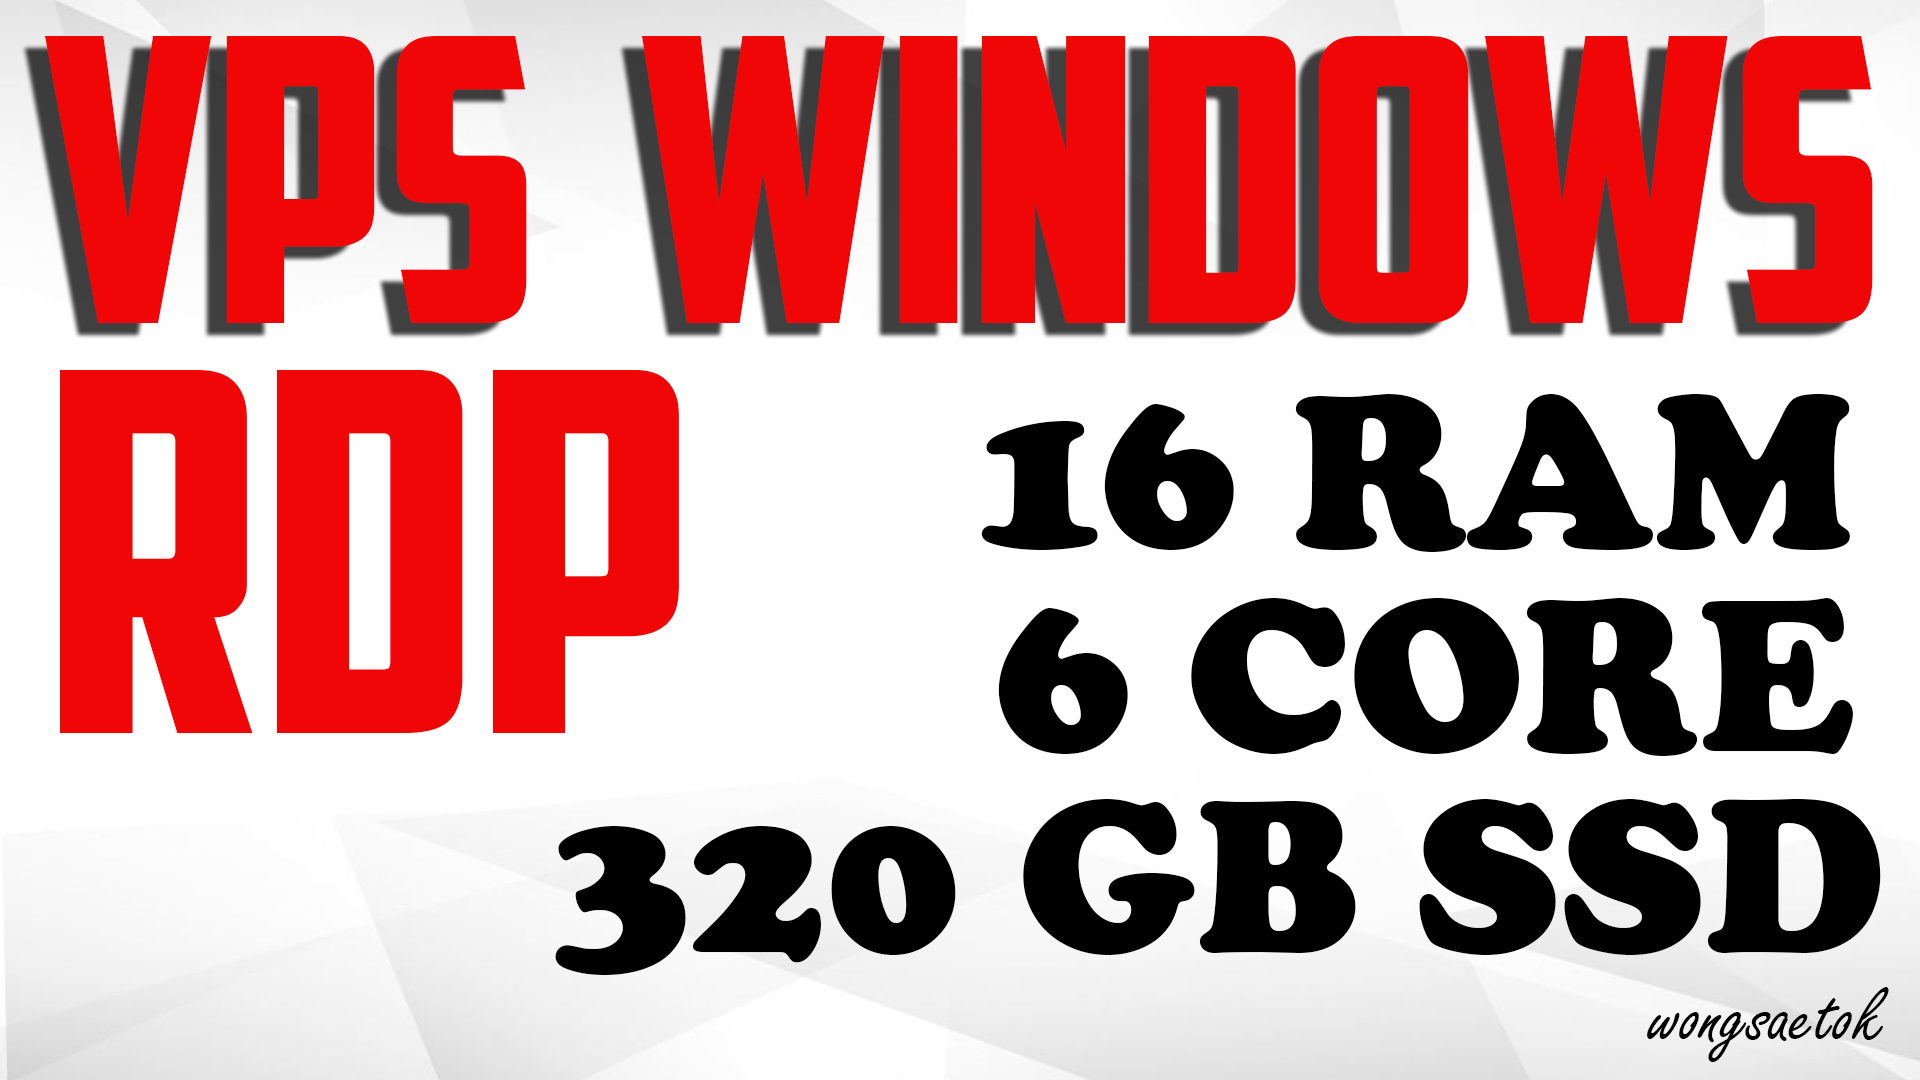 Windows VPS RDP 16 GB RAM 6 CPUs 320 GB SSD